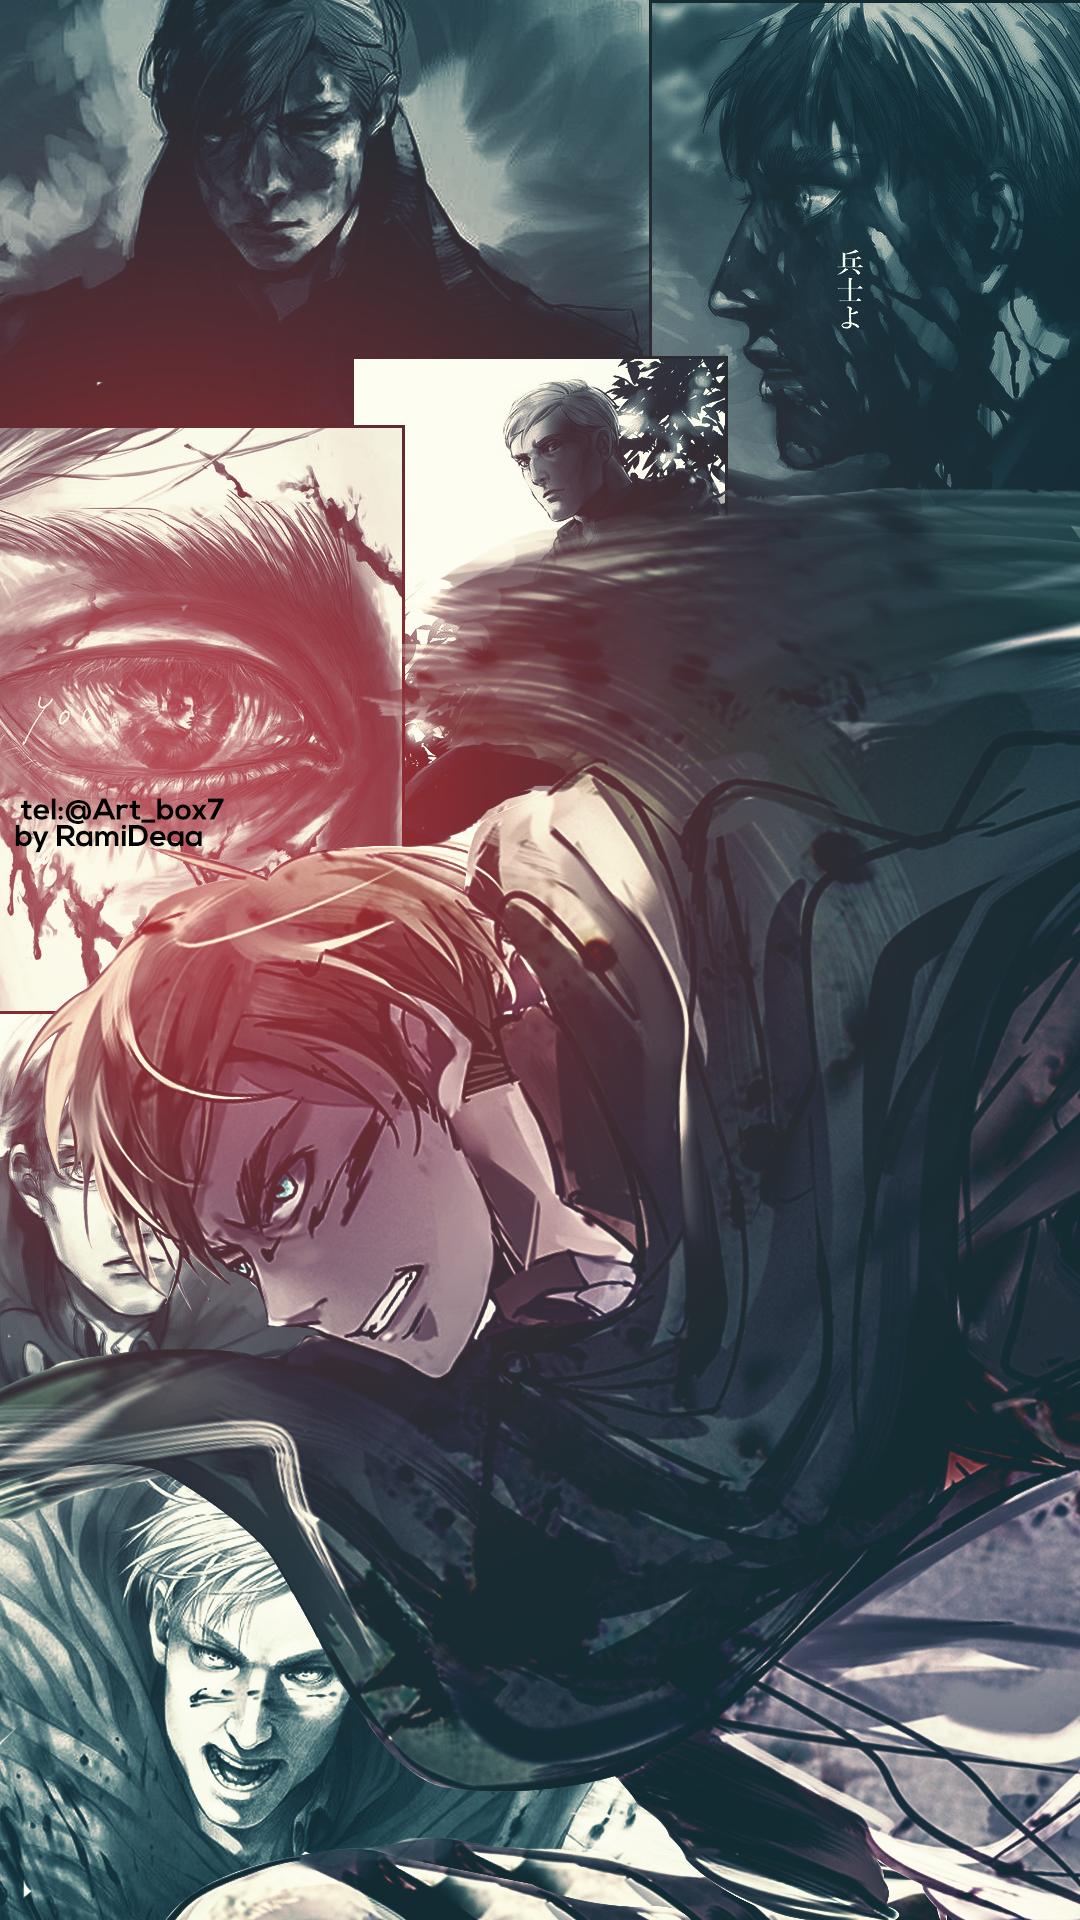 Erwin Smith Attack On Titan Attack On Titan Art Attack On Titan Anime Anime